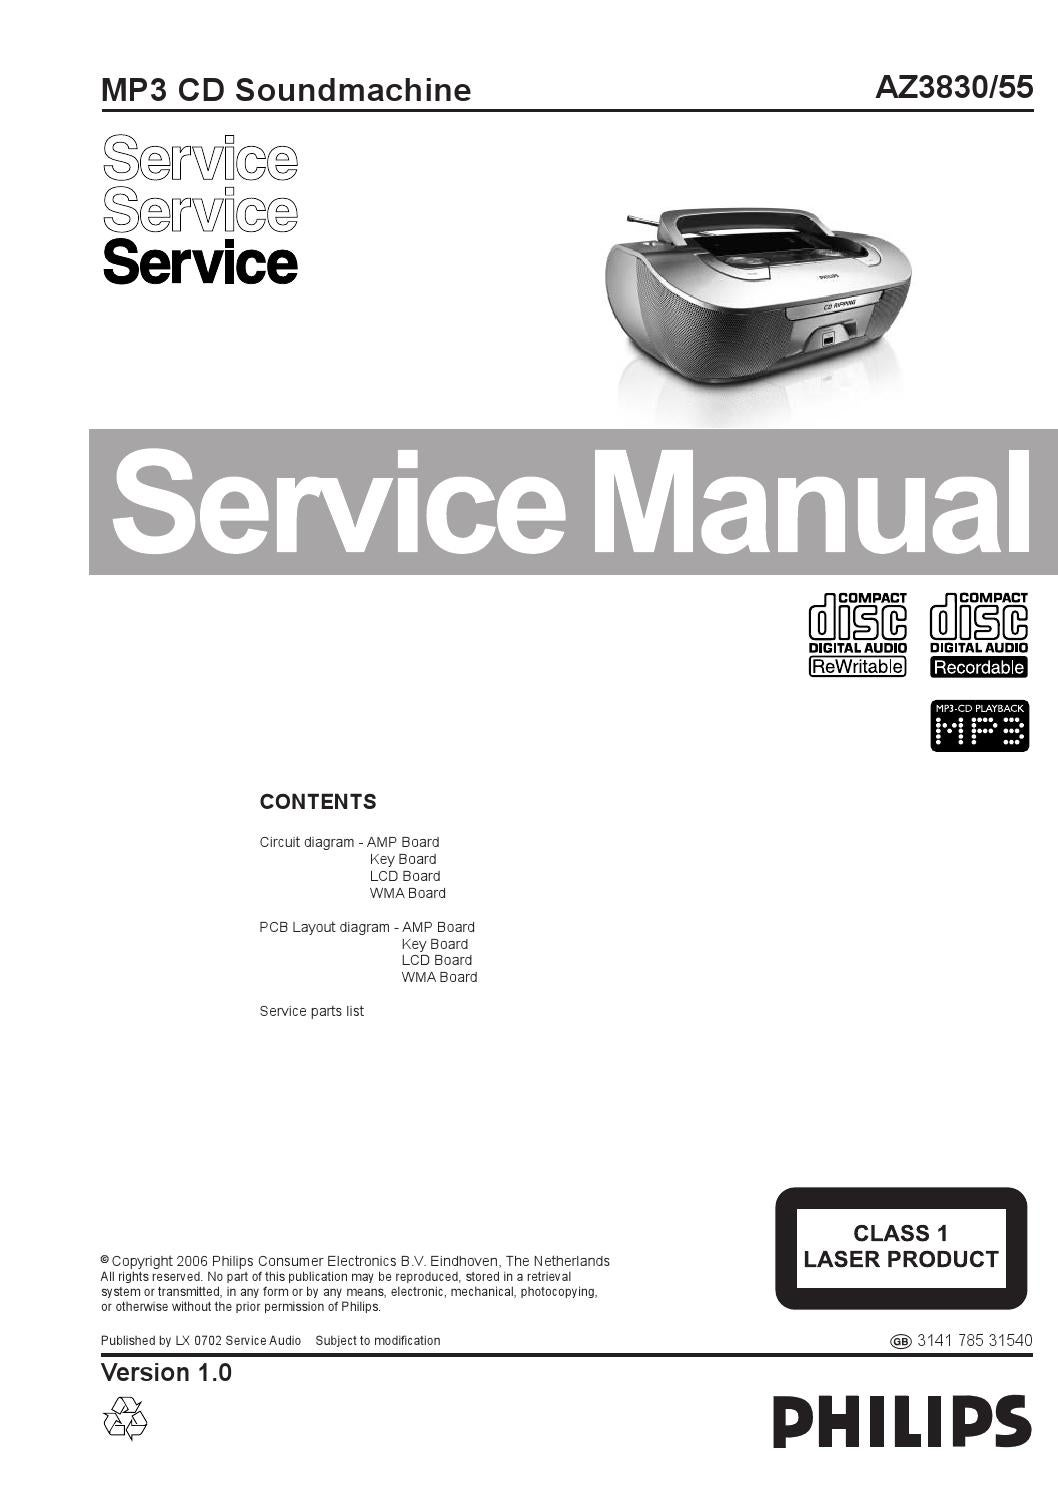 Manual de serviço radio PHILIPS modelo AZ3830-55. by